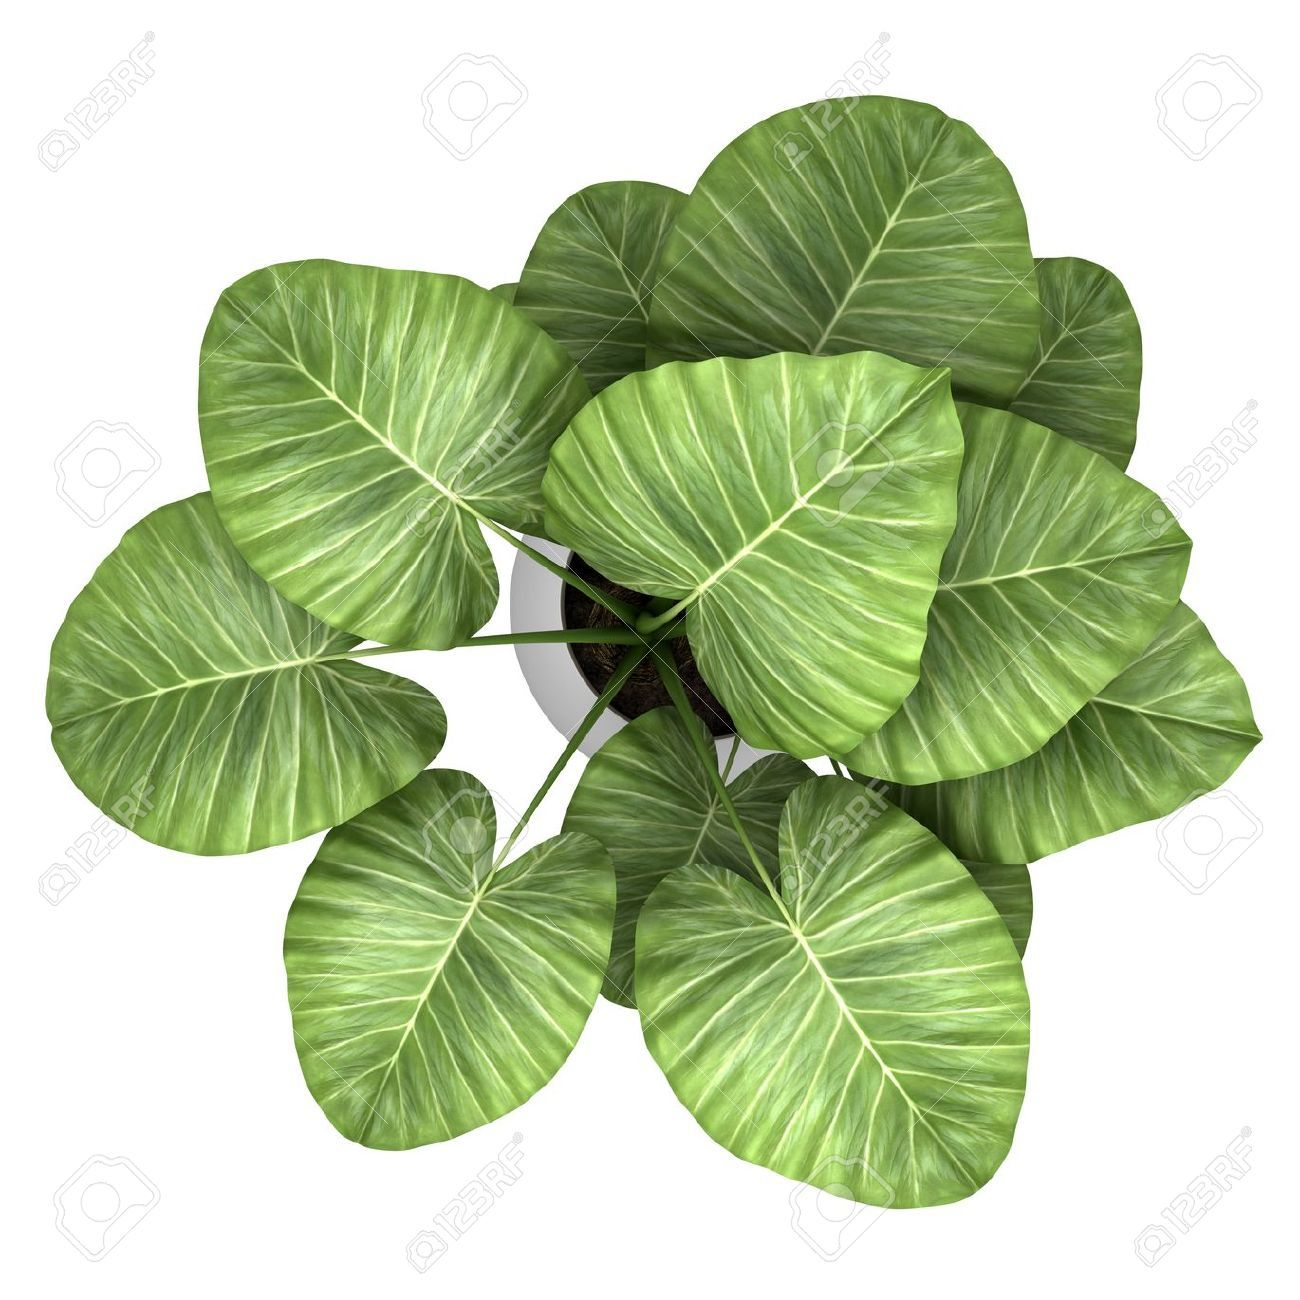 Pot plant top view google search green pinterest for Best aquatic plants